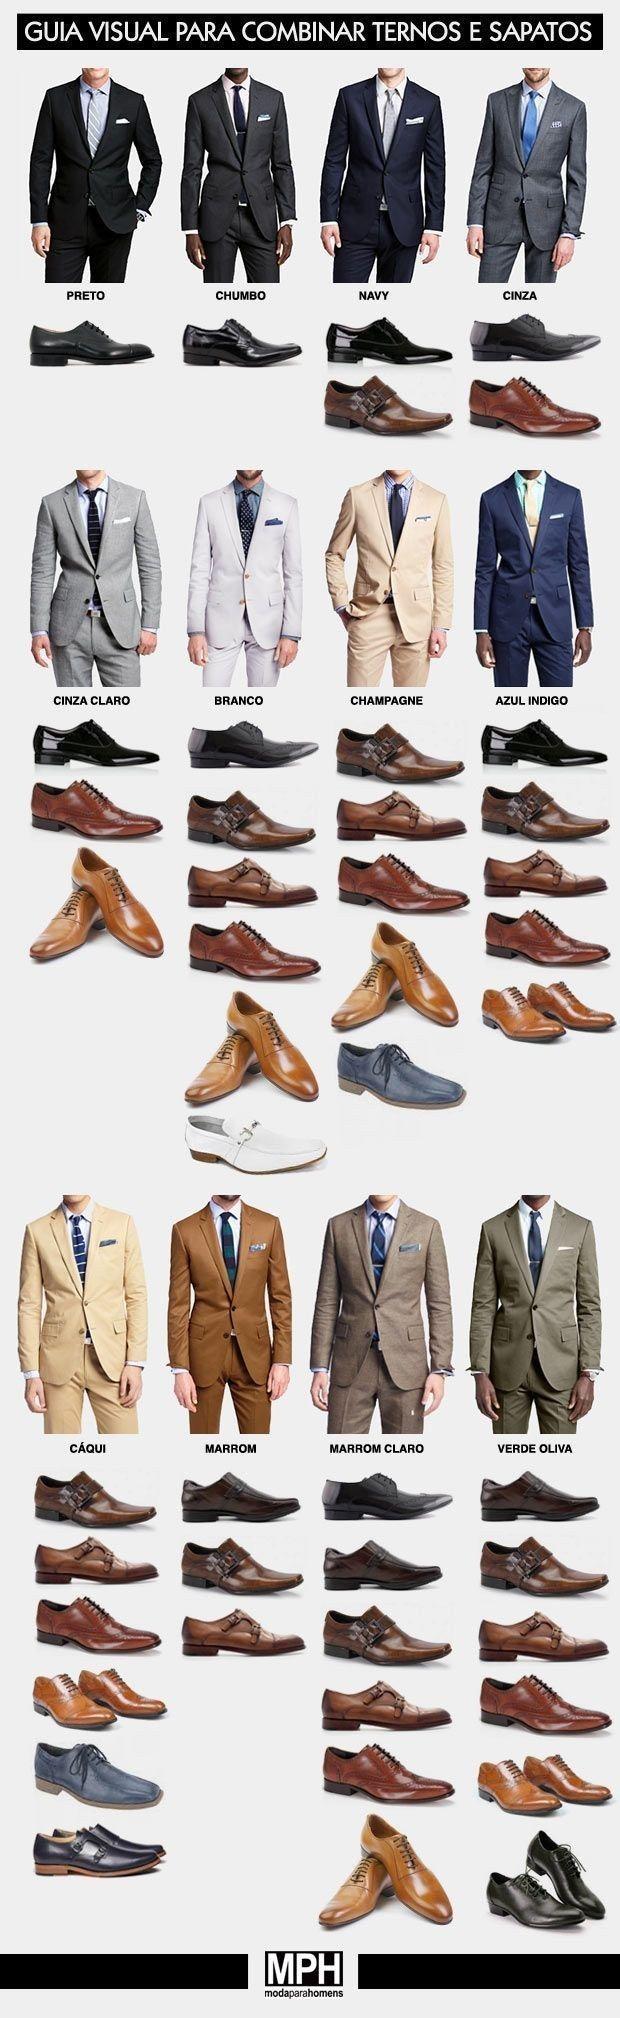 Suit and shoe Combinations men style #virileman5